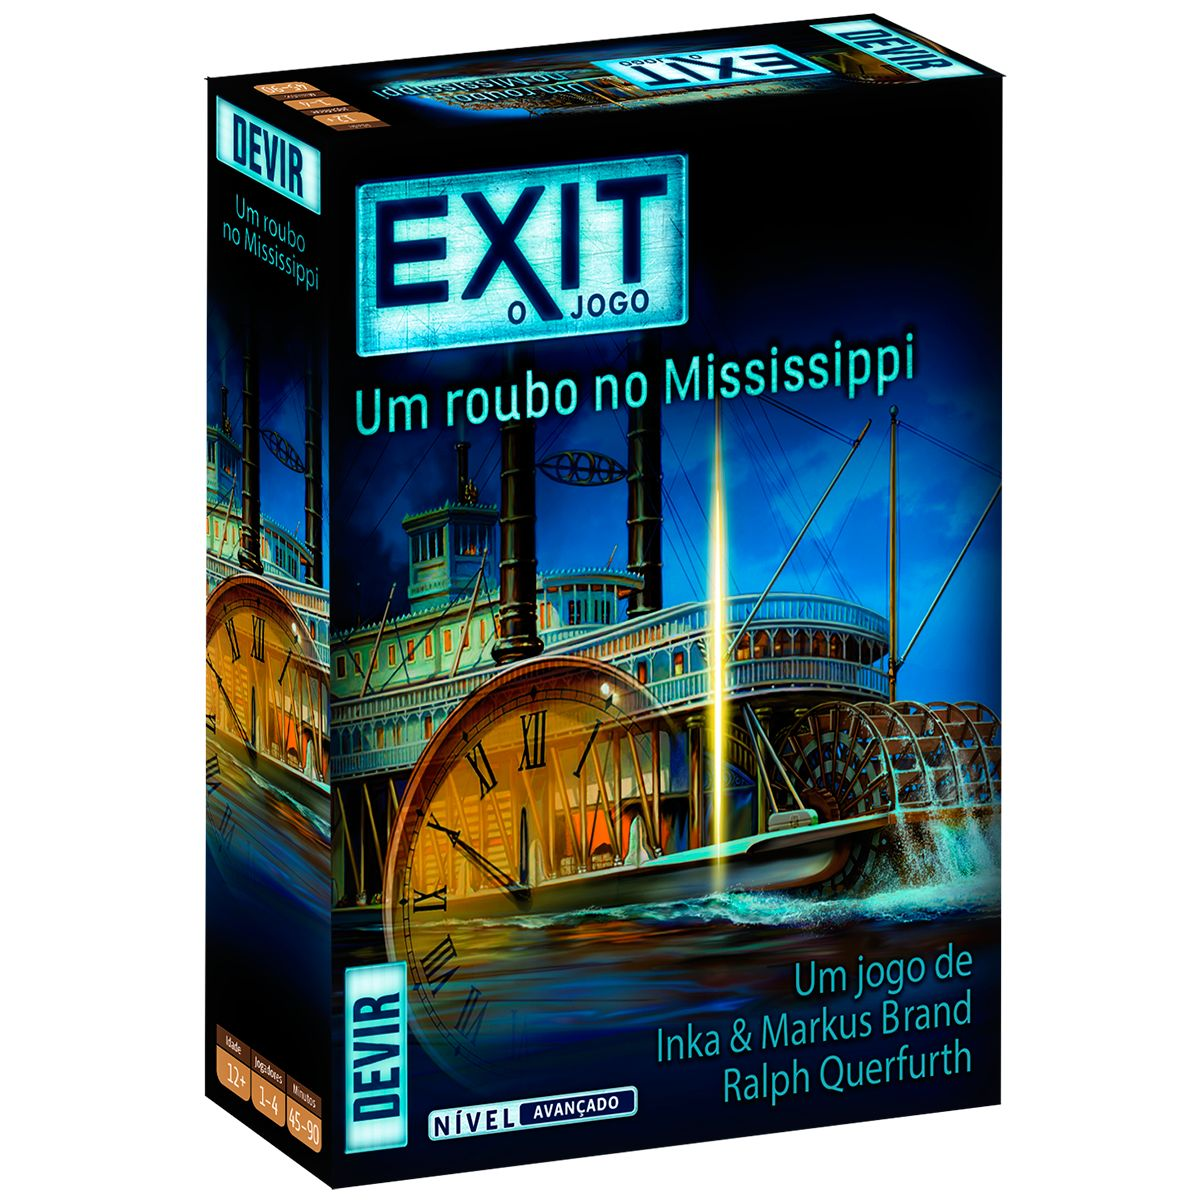 Exit Um roubo no Mississippi Scape Room